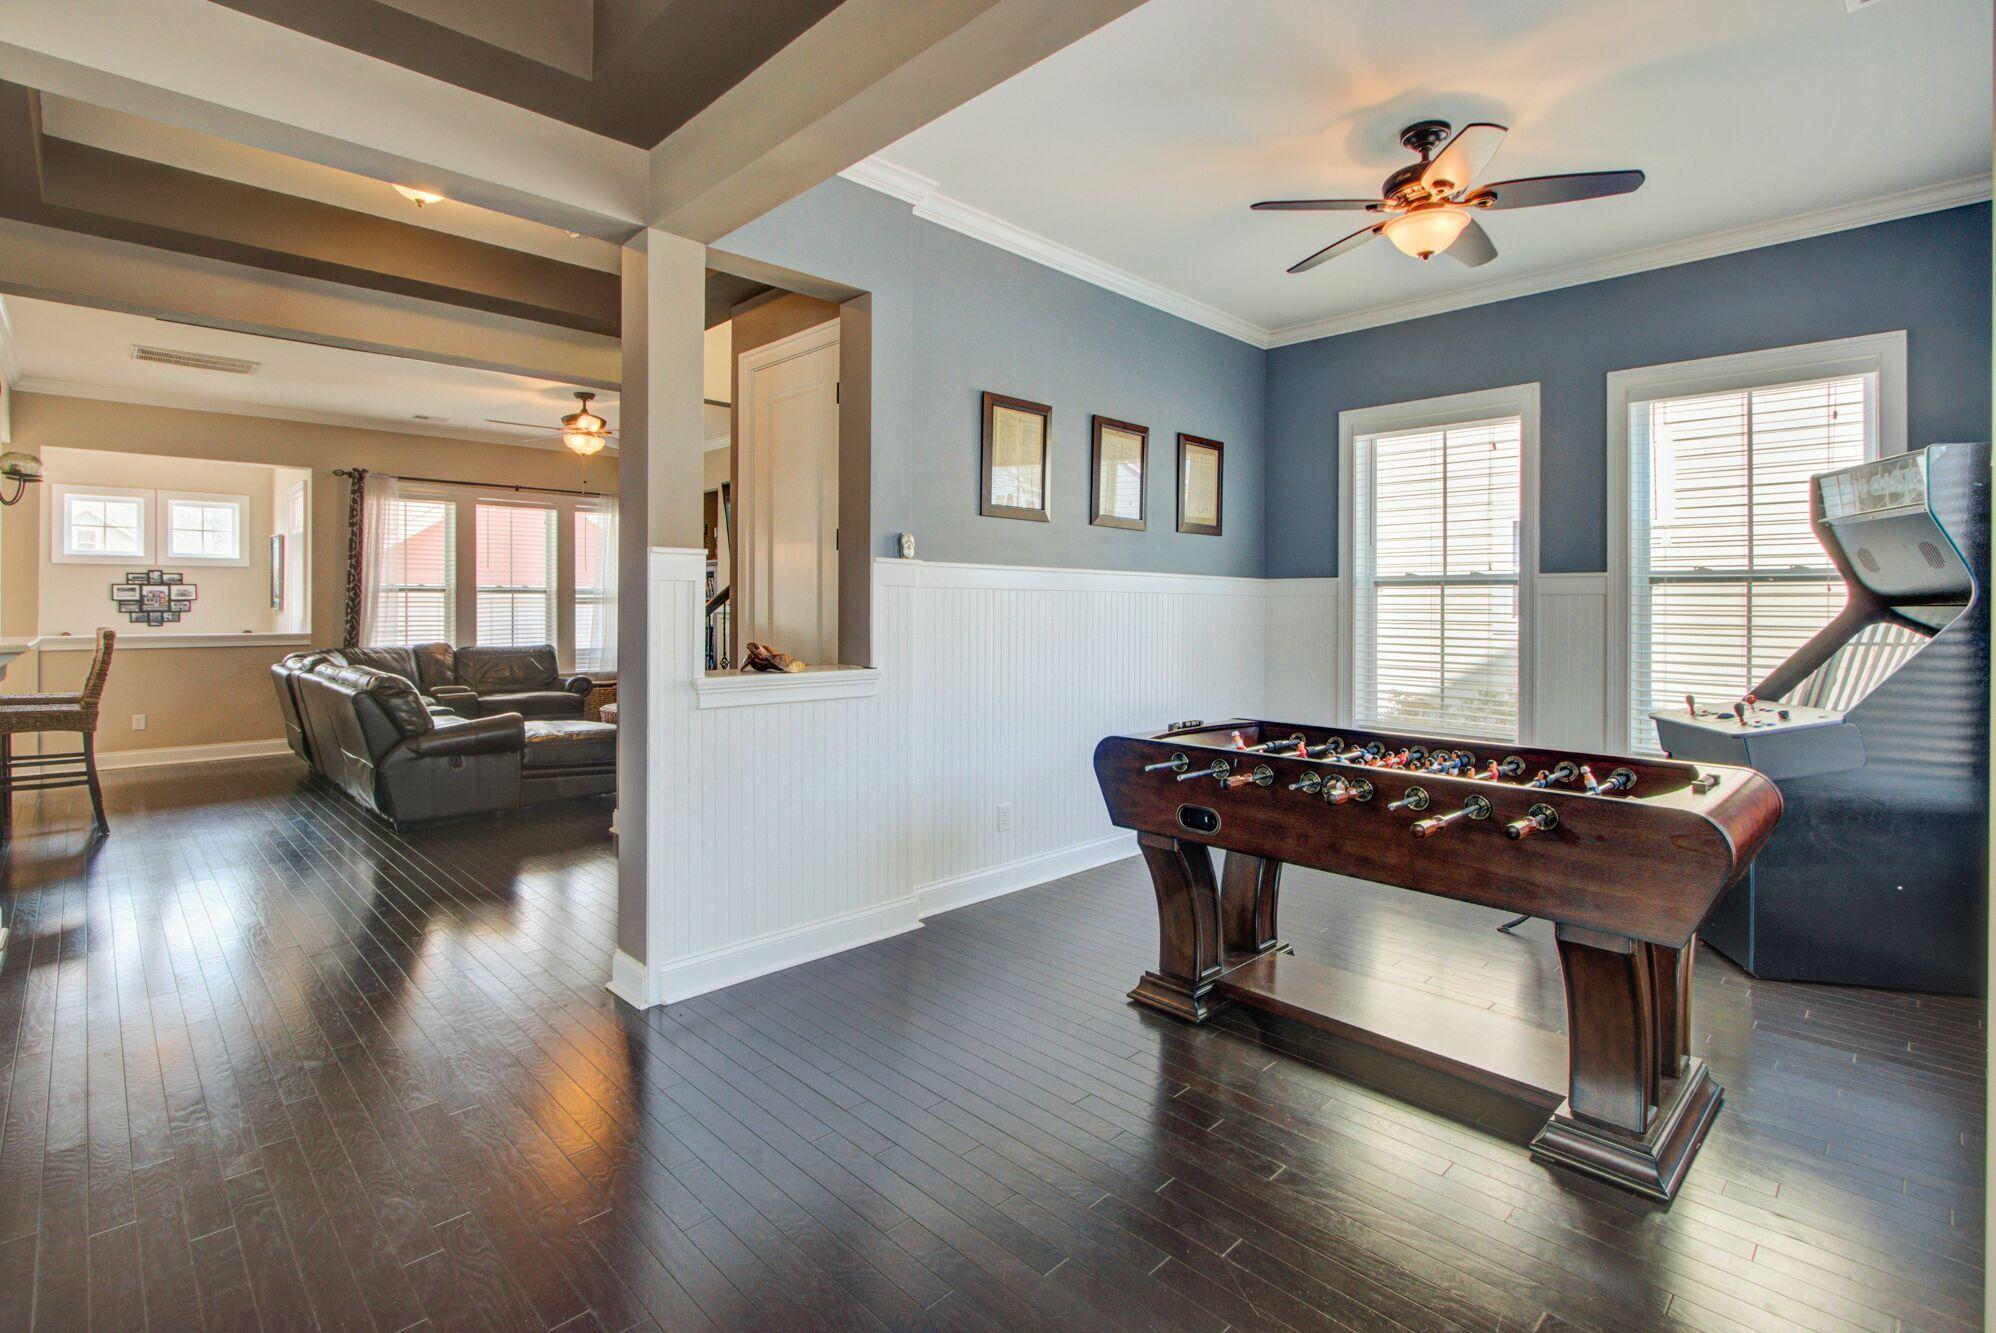 Carolina Park Homes For Sale - 3614 Shutesbury, Mount Pleasant, SC - 36